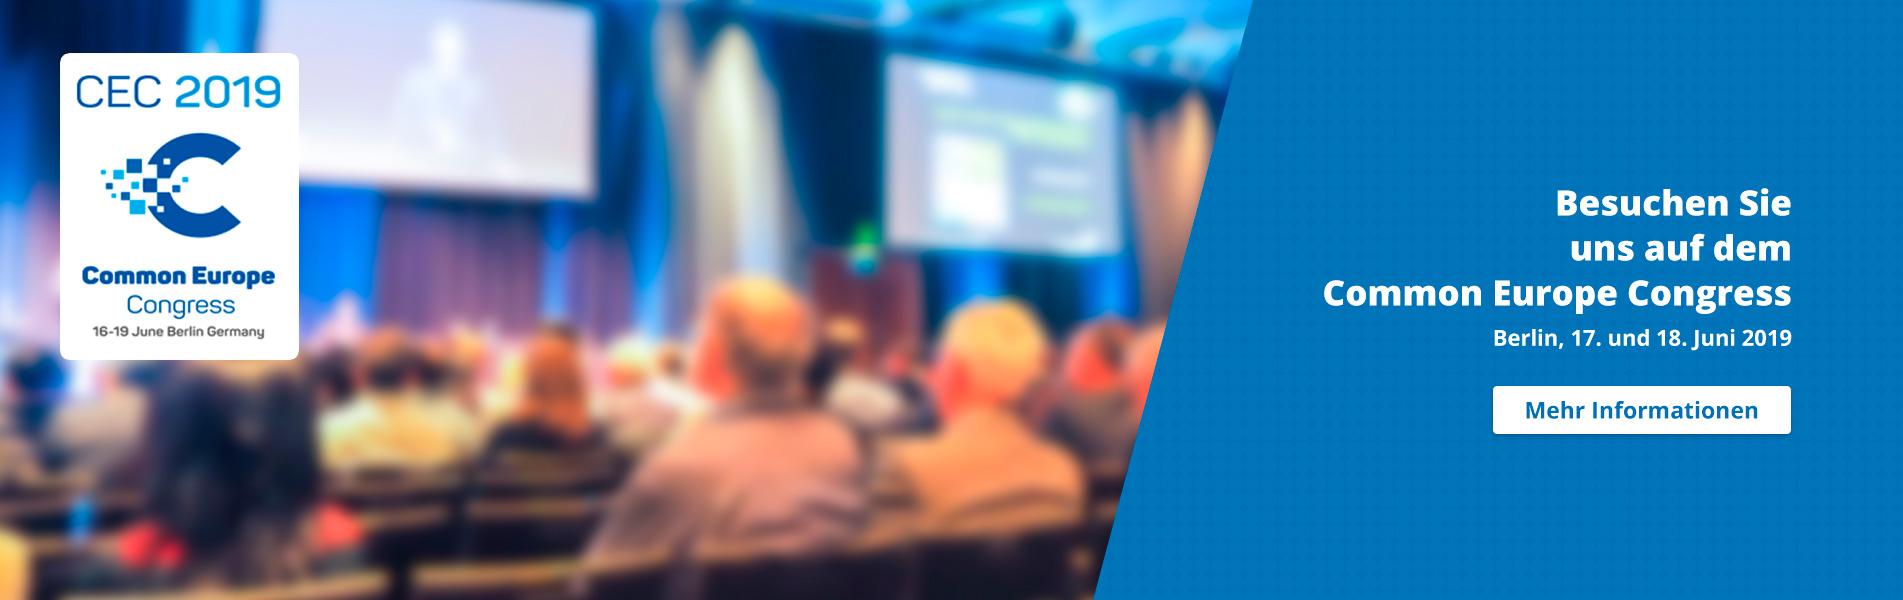 Common Europe Congress 2019 EDI IBM i&#8209;effect<sup>&reg;</sup> menten